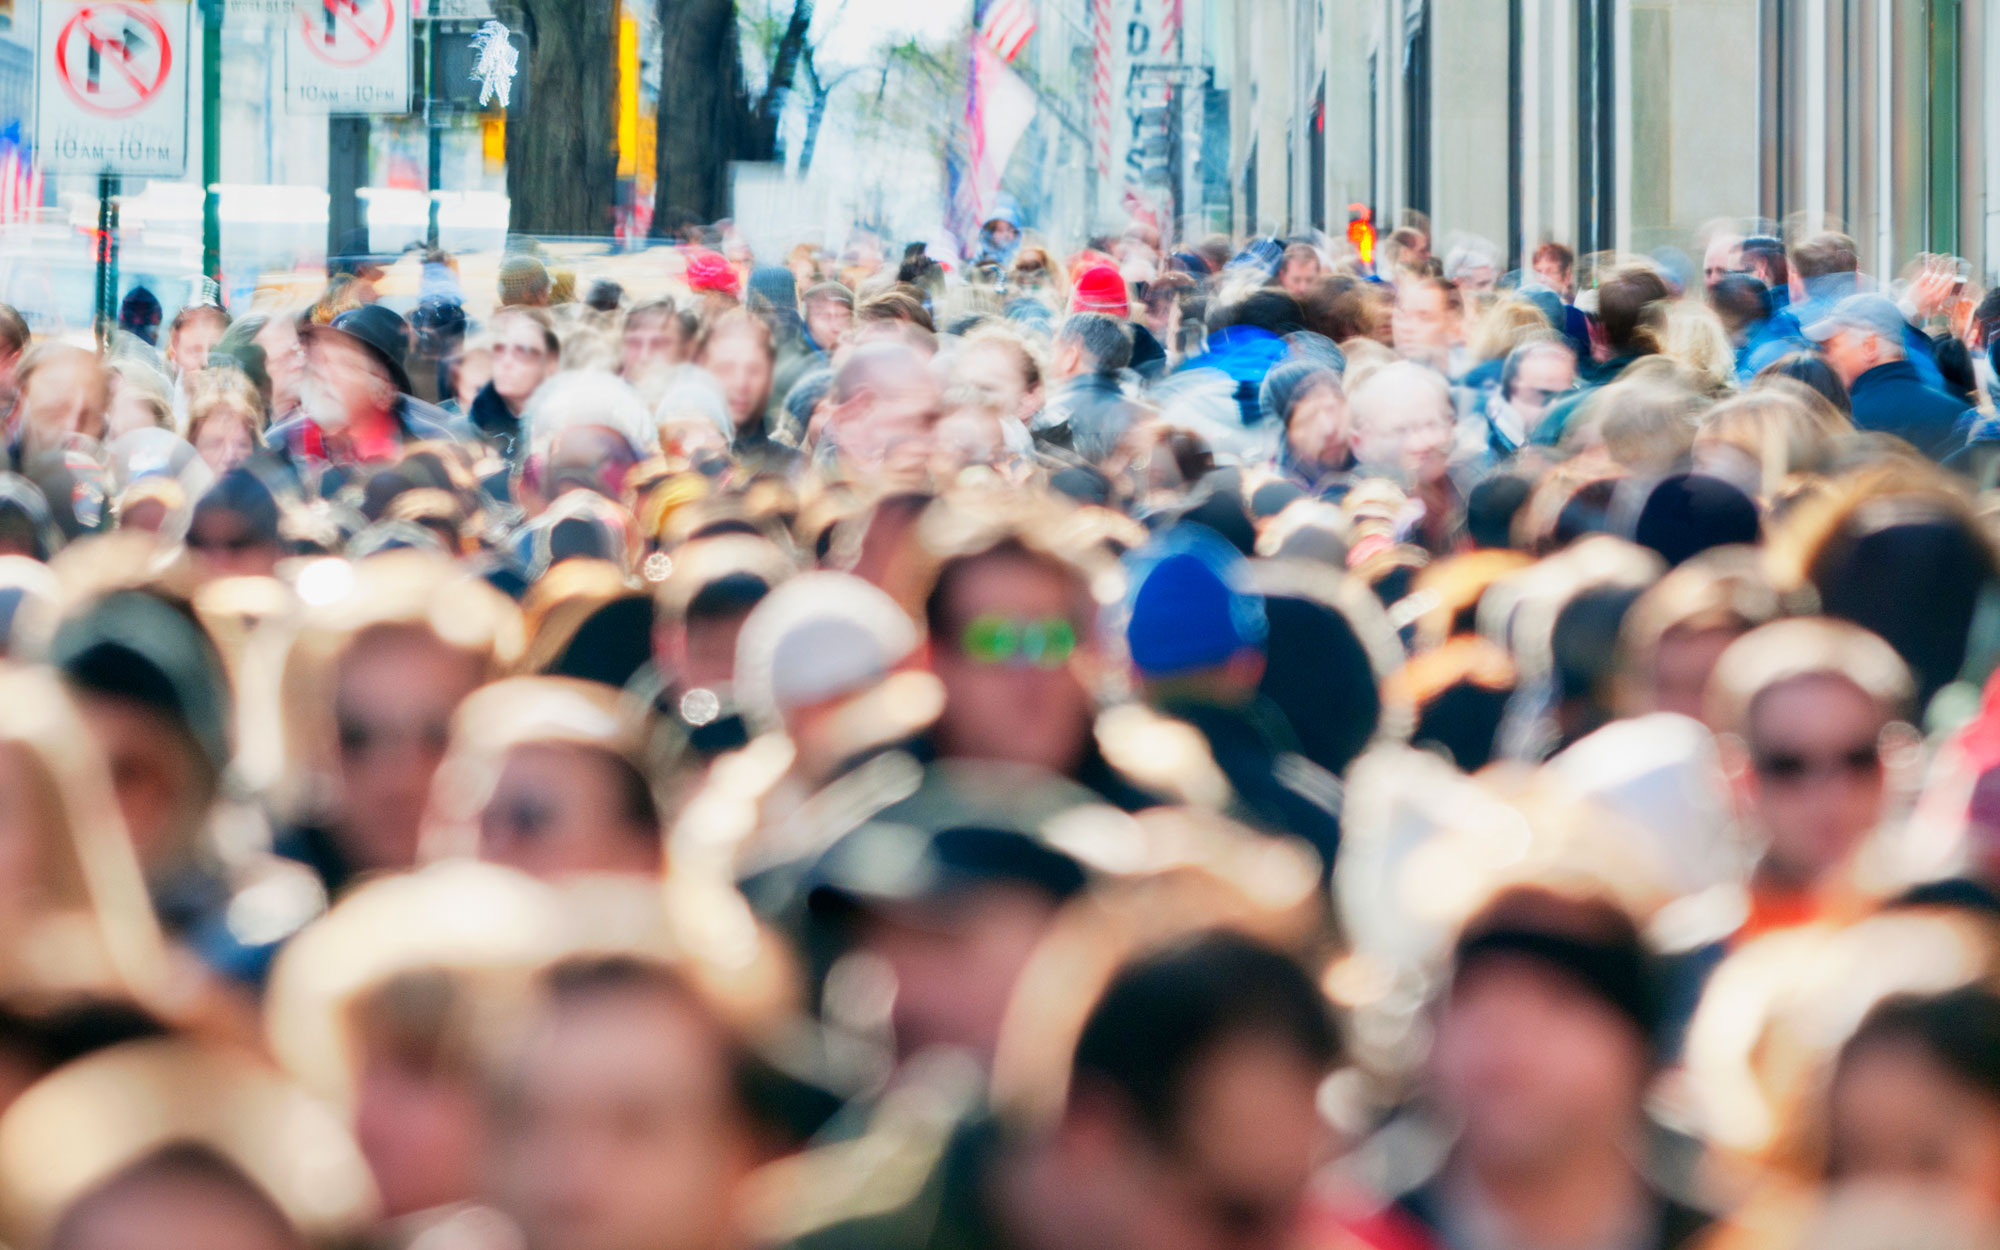 Crowded City